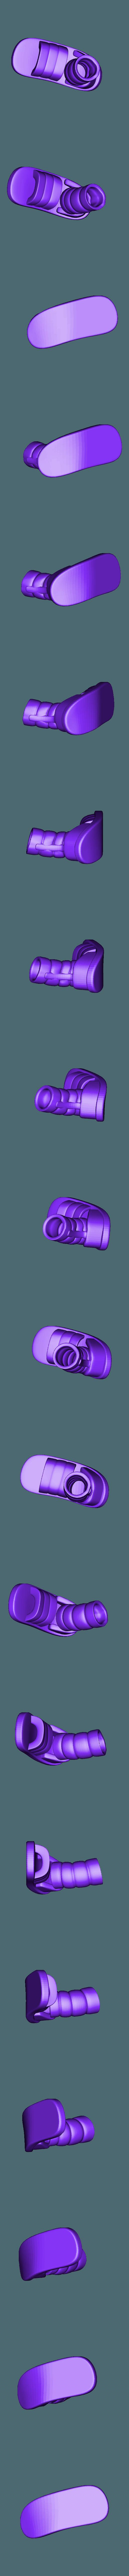 POMPESROMAIN D.stl Descargar archivo STL FANART - Obélix abofetea a un legionario romano - Diorama • Objeto para impresora 3D, foxgraph